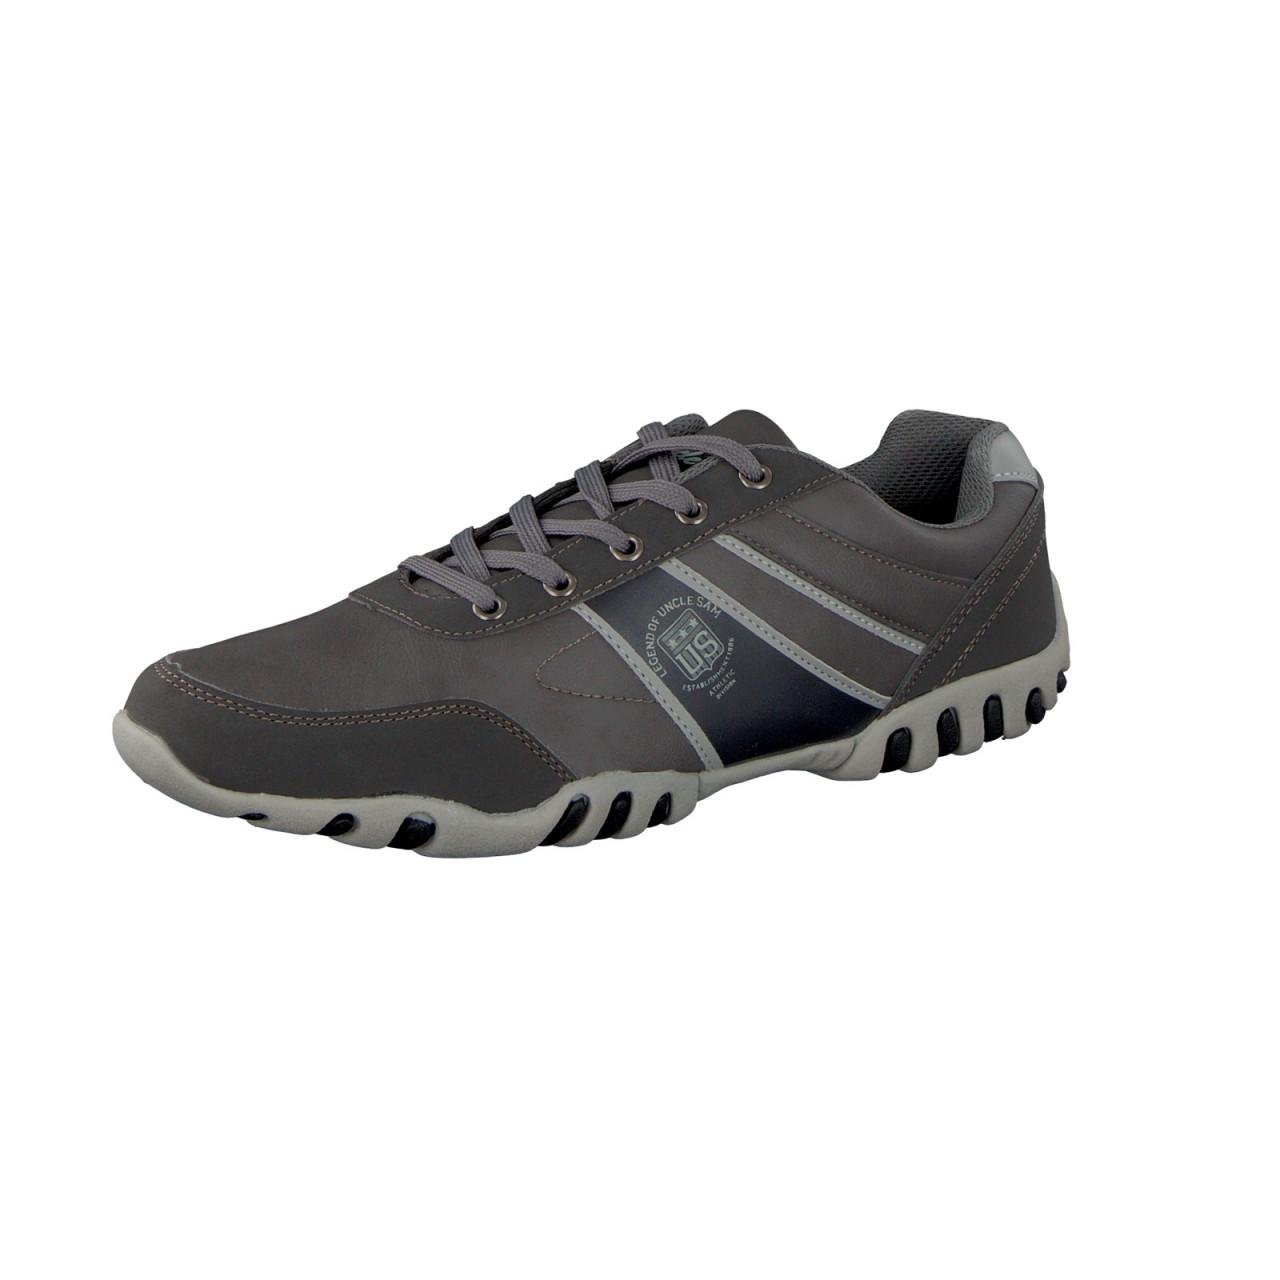 UNCLE SAM Herren Fashion Sneaker, Grau